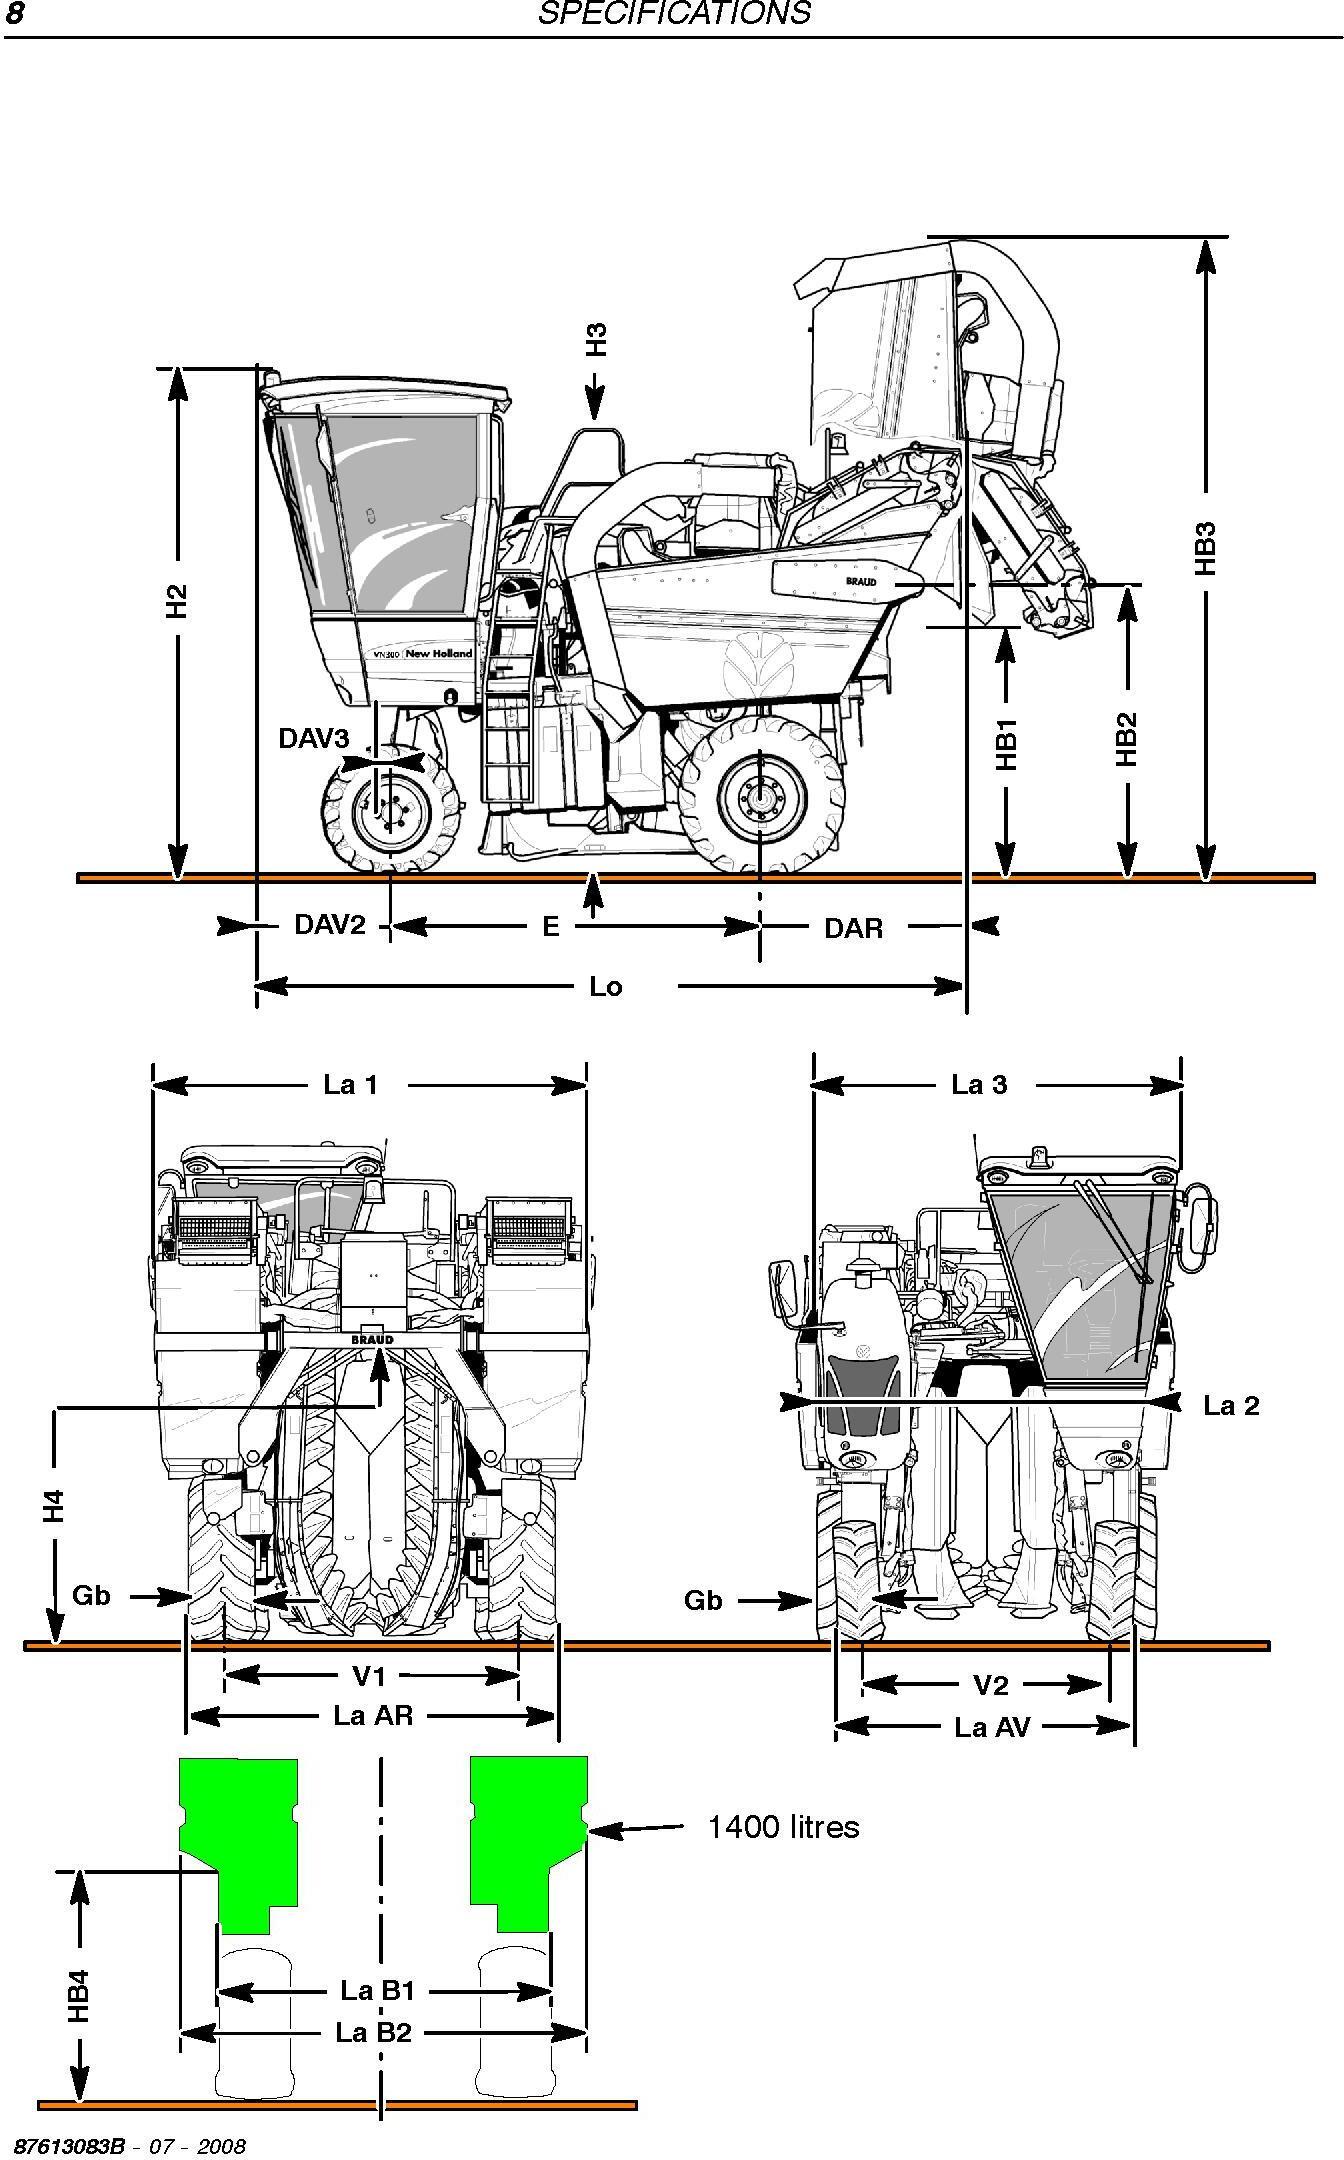 New Holland VL5090, VL6040, VL6050, VL6060, VL6070, VL6080, VL6090, VM3090, VM4090, VN2090 Grape Harvester Service Manual - 1